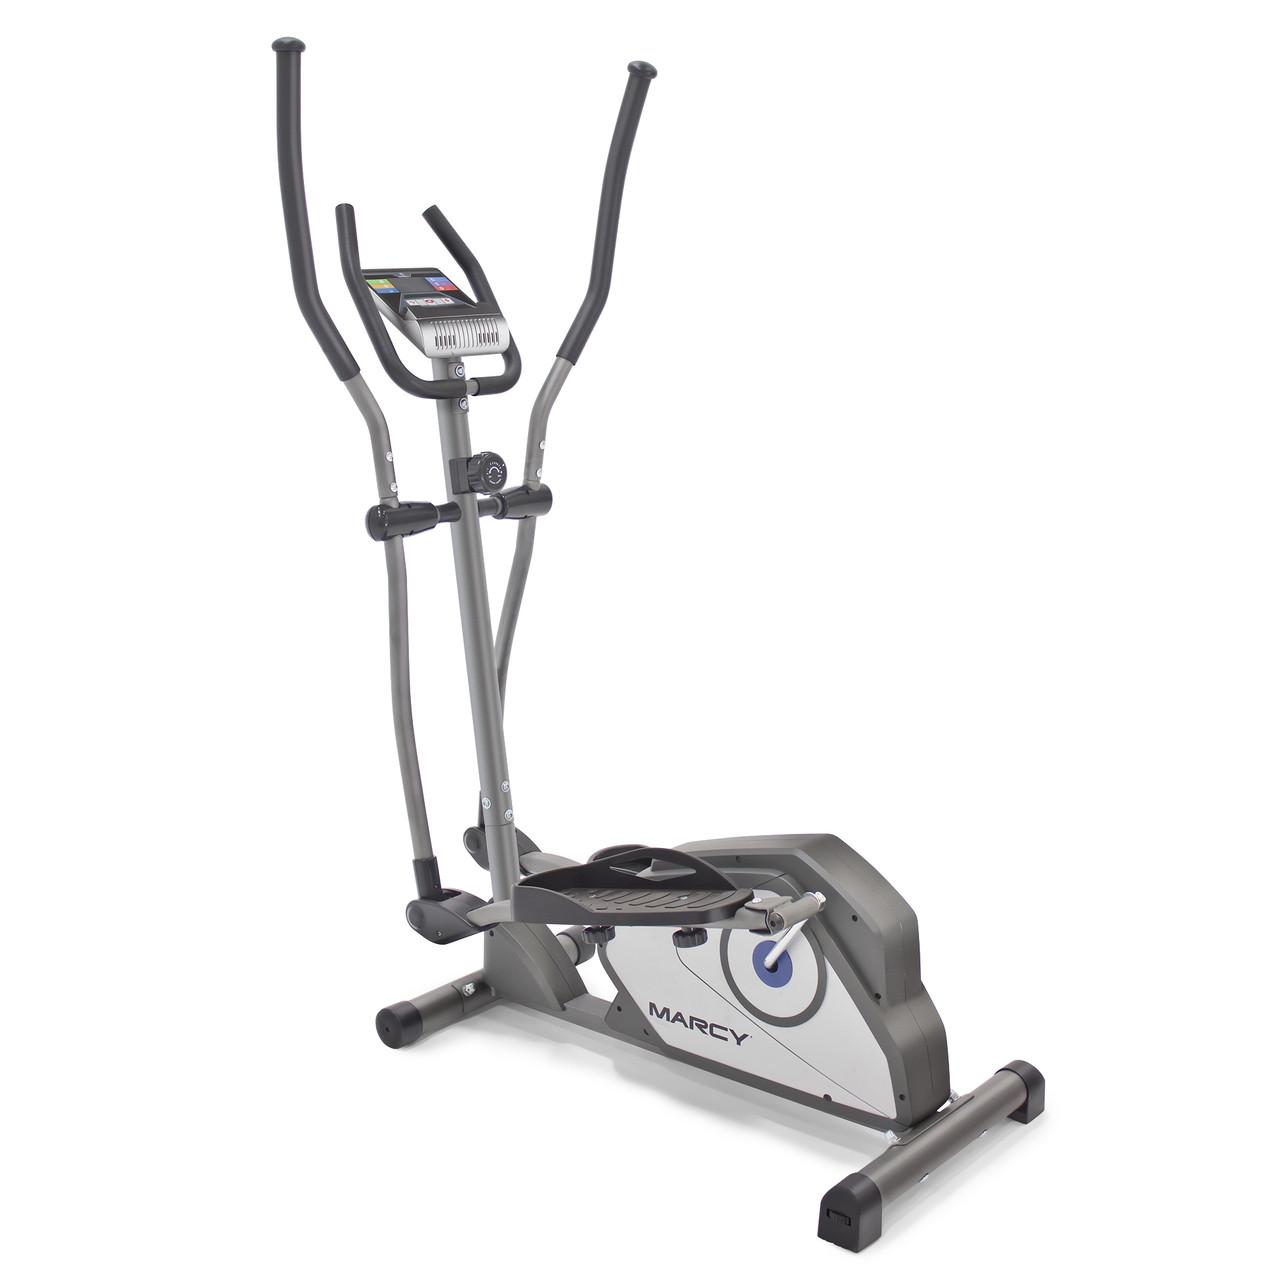 elliptical trainer marcy ns 40501e quality cardio exercise elliptical